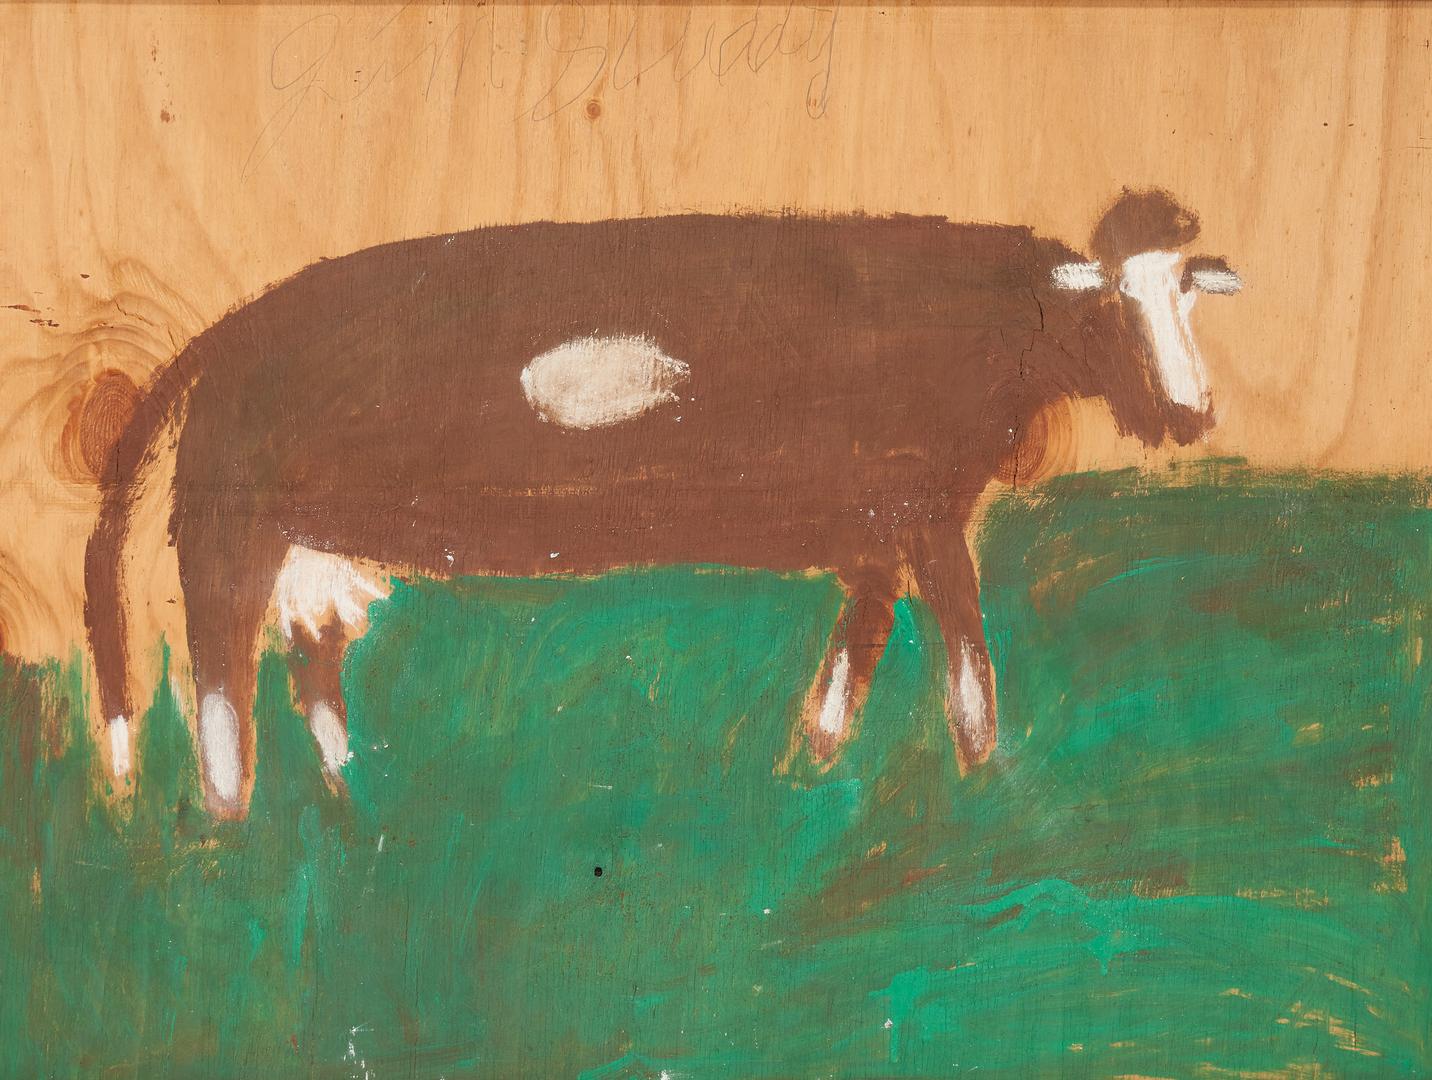 Lot 172: Large J.L. Sudduth Cow Painting